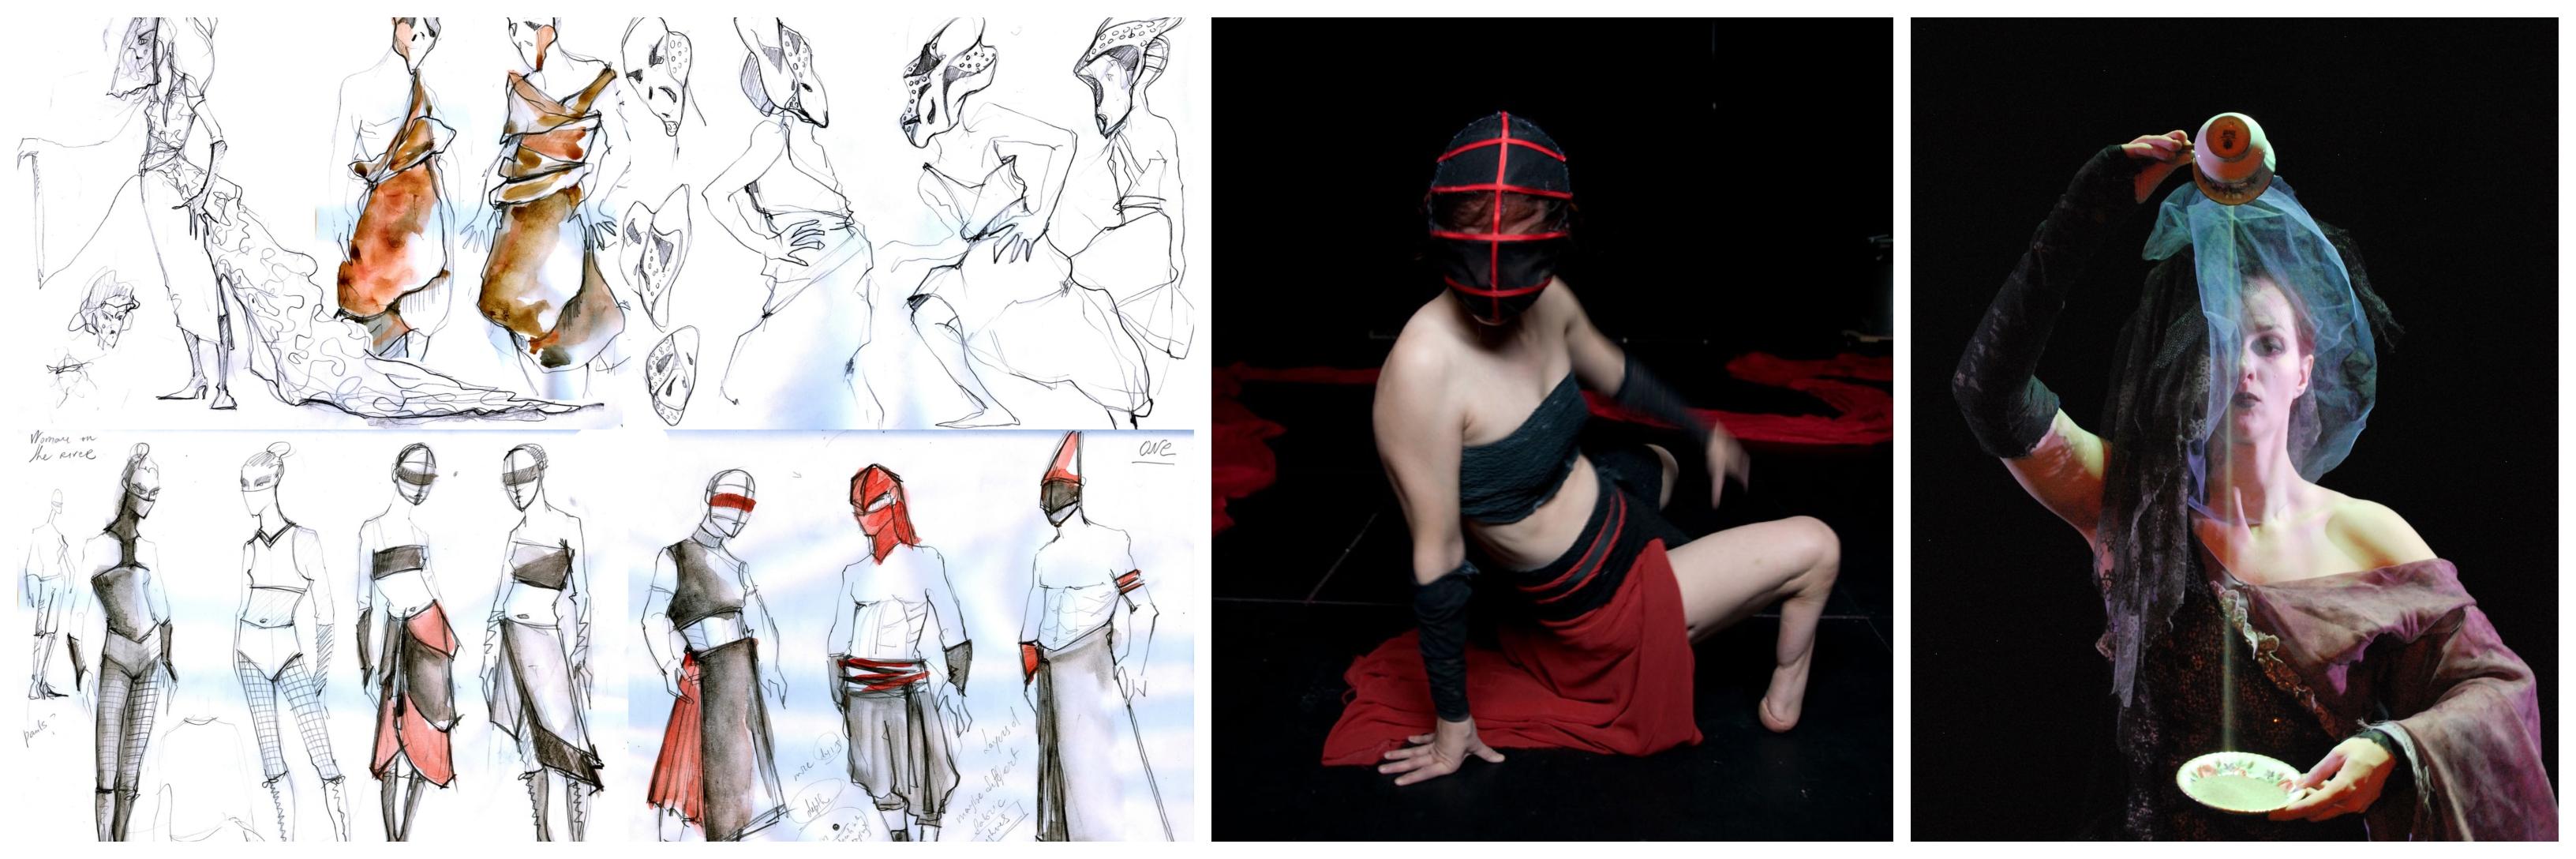 Collage of Snezana Pesic's costume designs